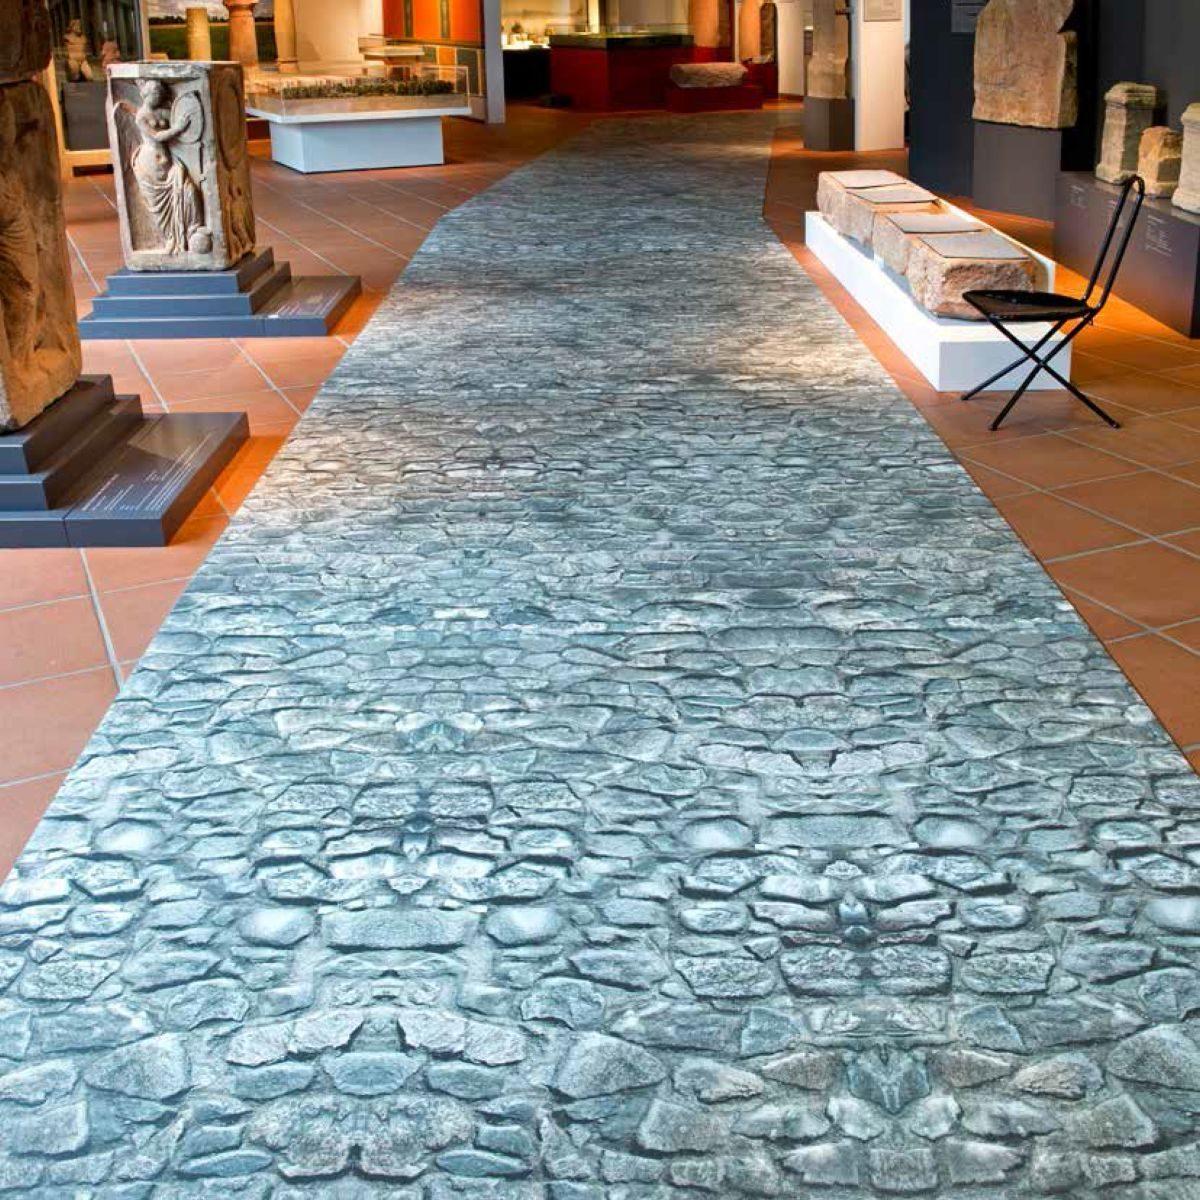 22purline-digital_anticka-cesta-z-rimske-dlazby-v-muzeu-reiss-engelhorn-v-mannheimu_kpp-1200x1200.jpg